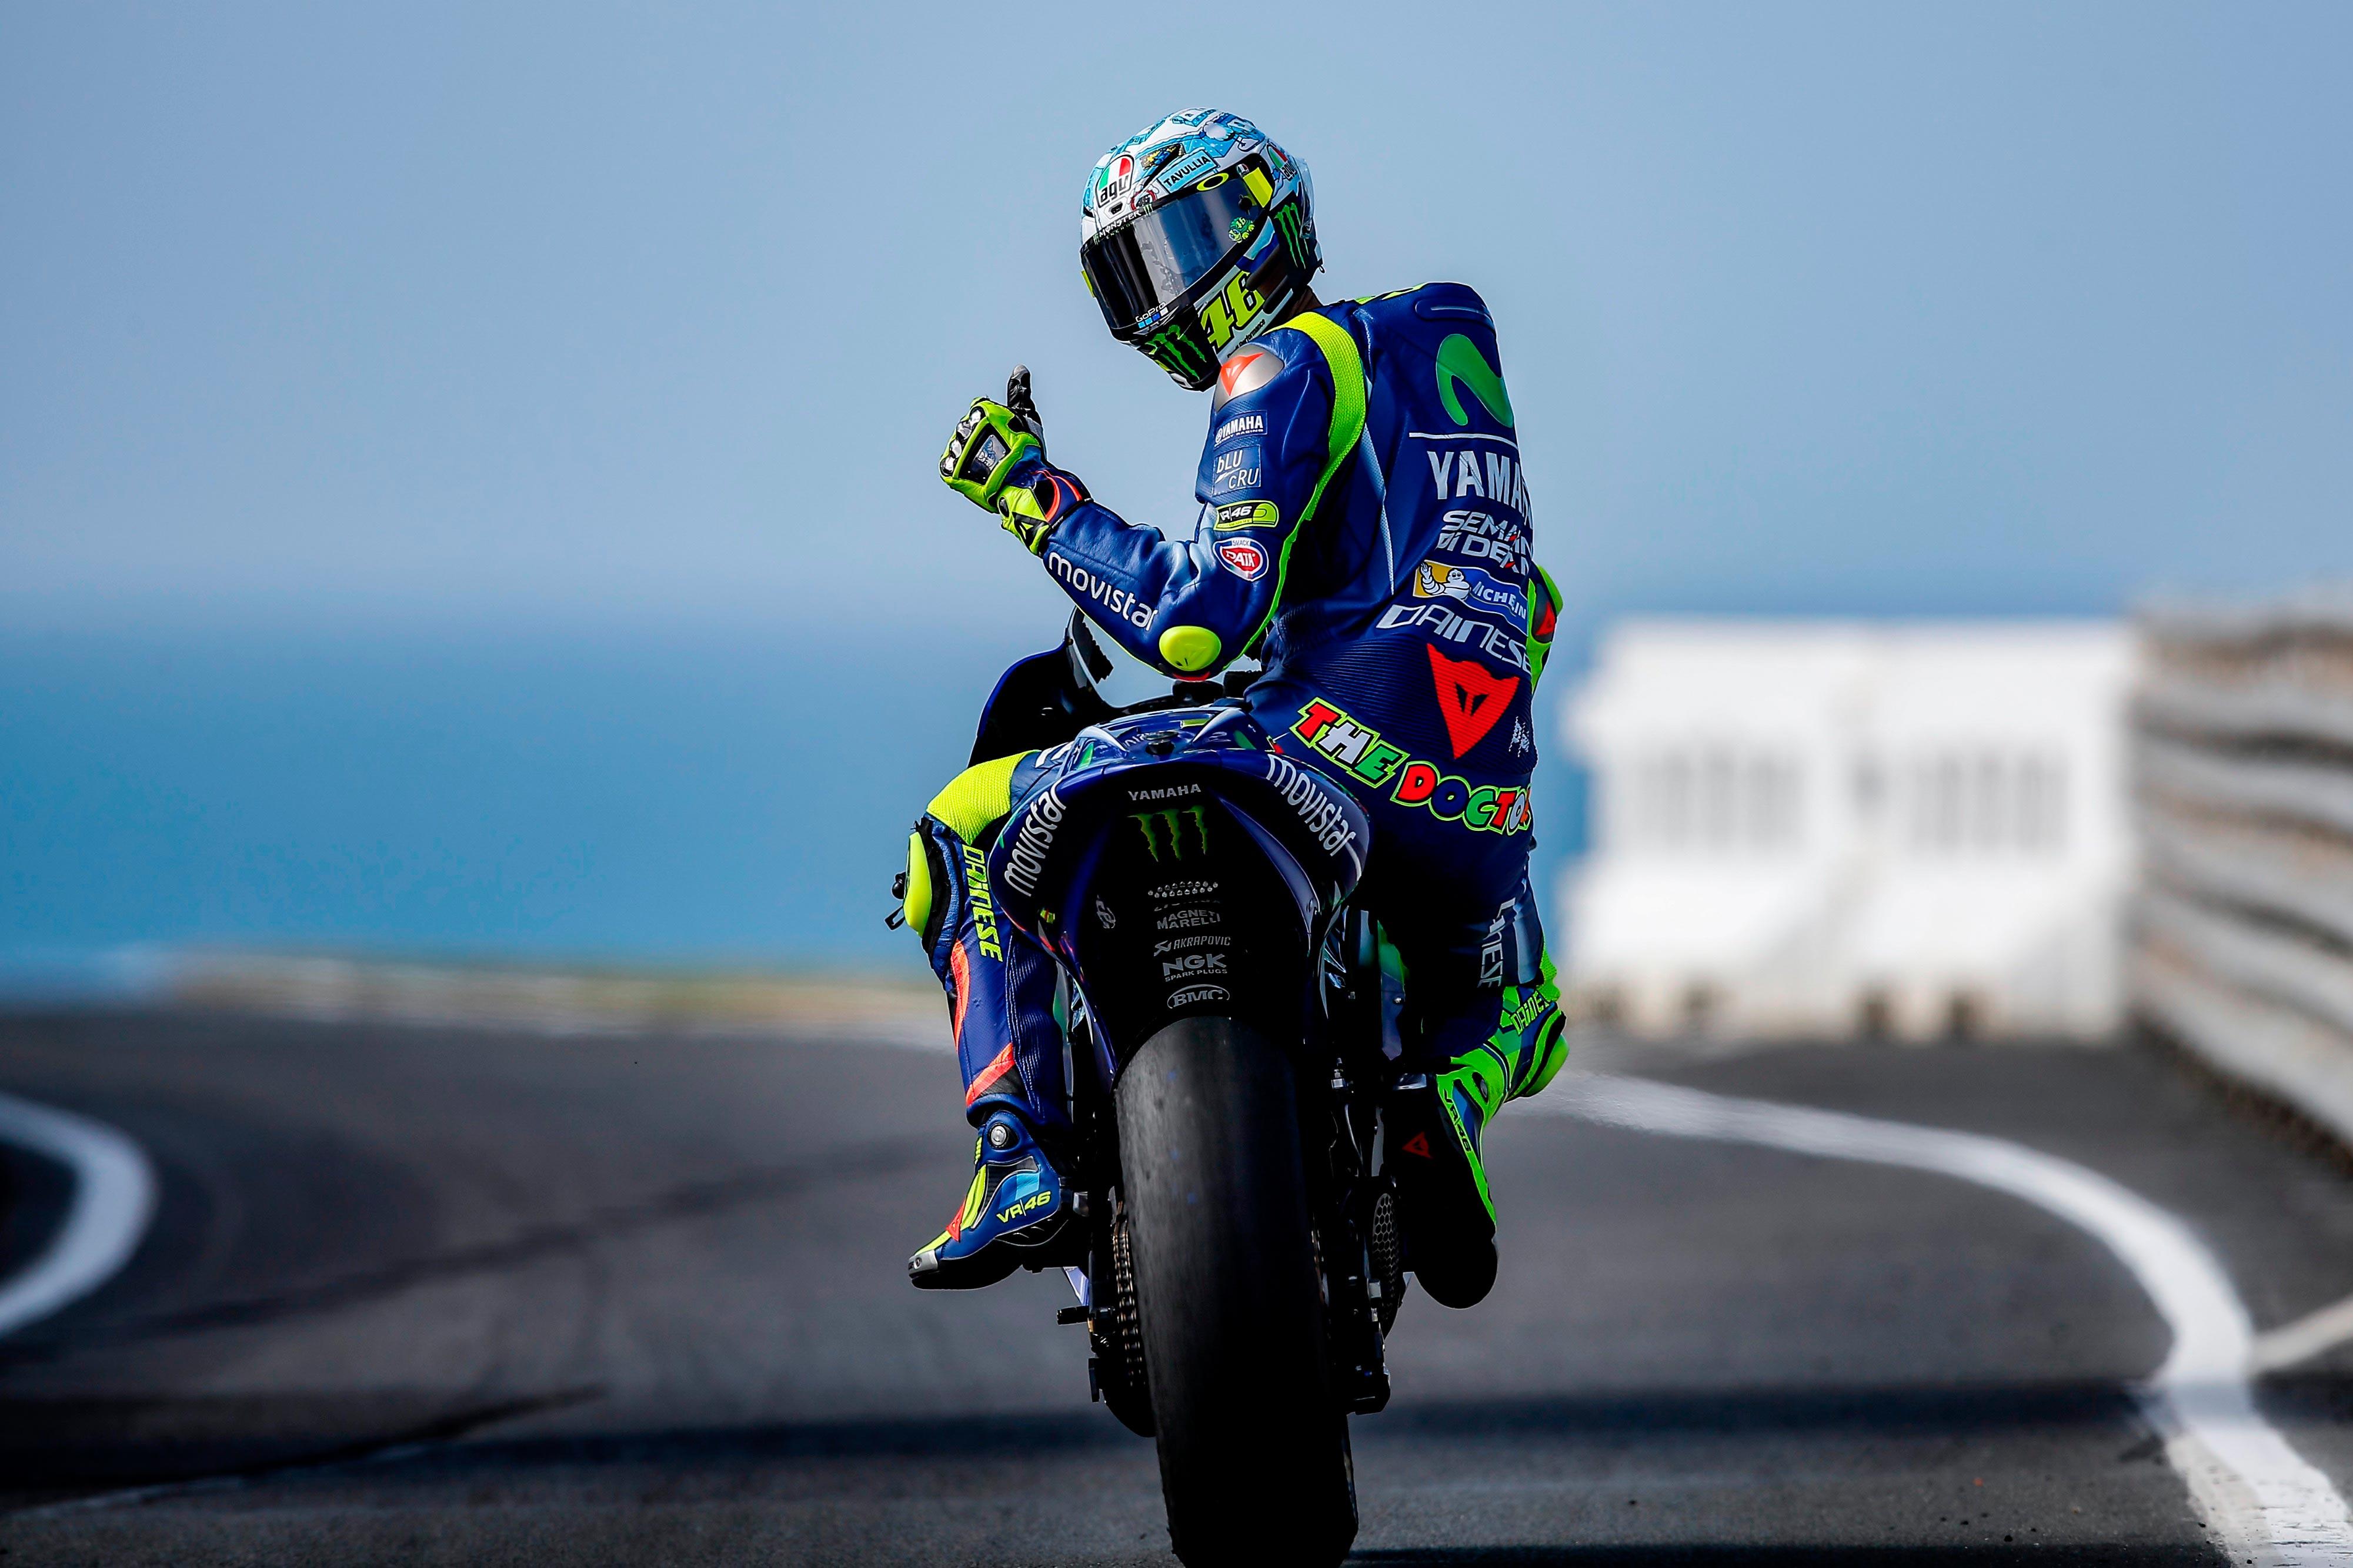 MotoGP Phillip Island MotoGP Test Summary – Day 3 - Asphalt & Rubber